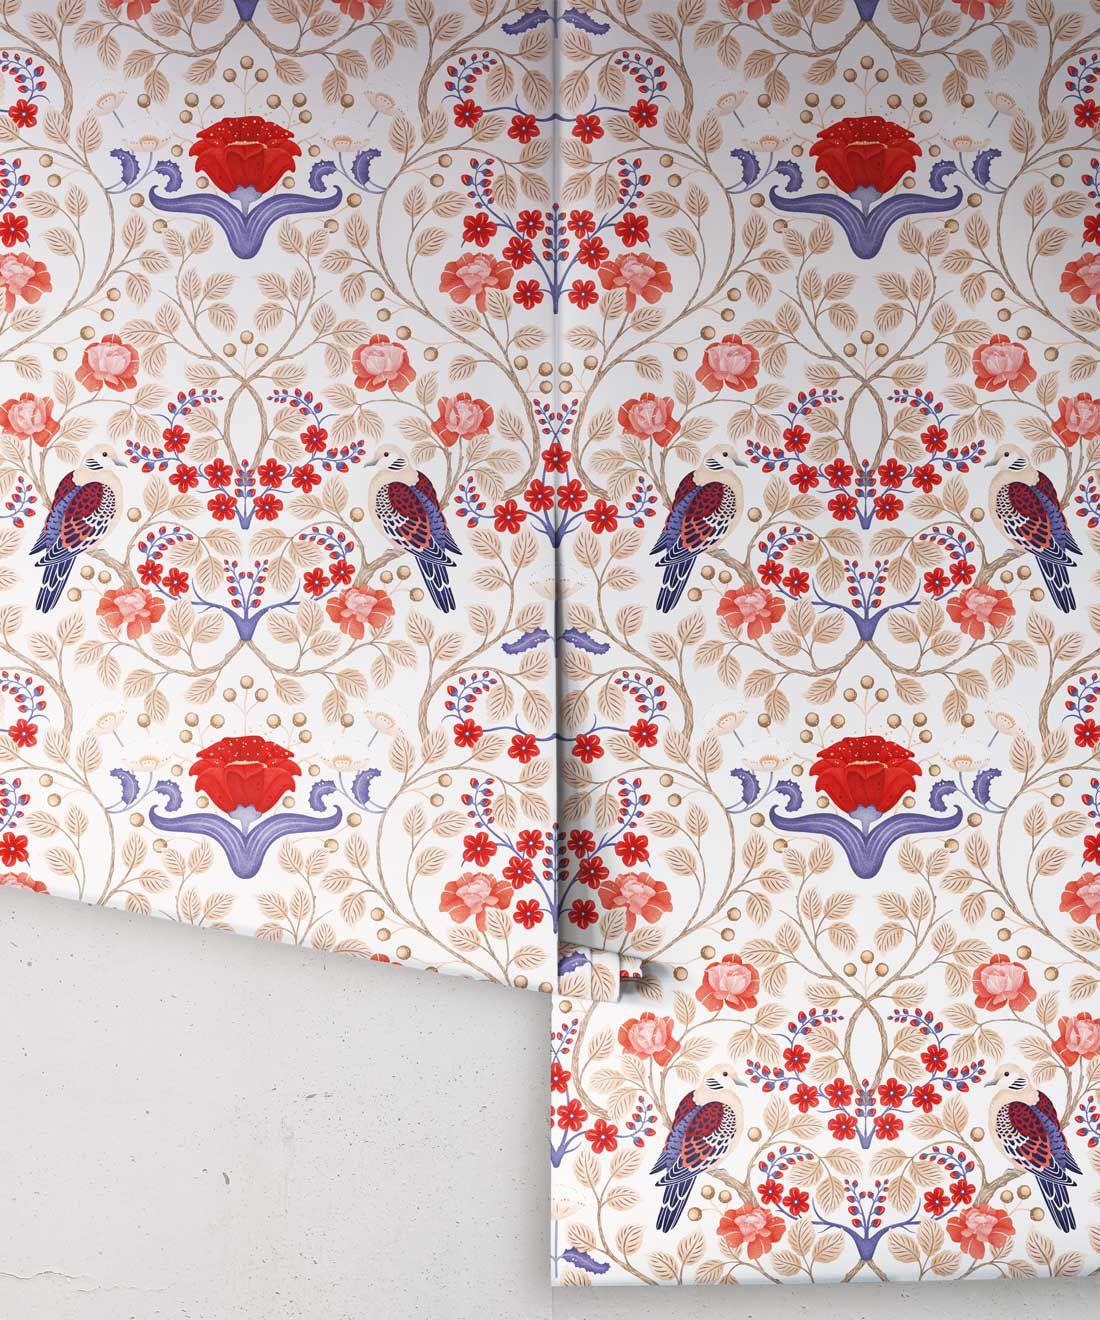 Turtle Doves Wallpaper • Bold Colorful Bird Wallpaper • Creme •Rolls